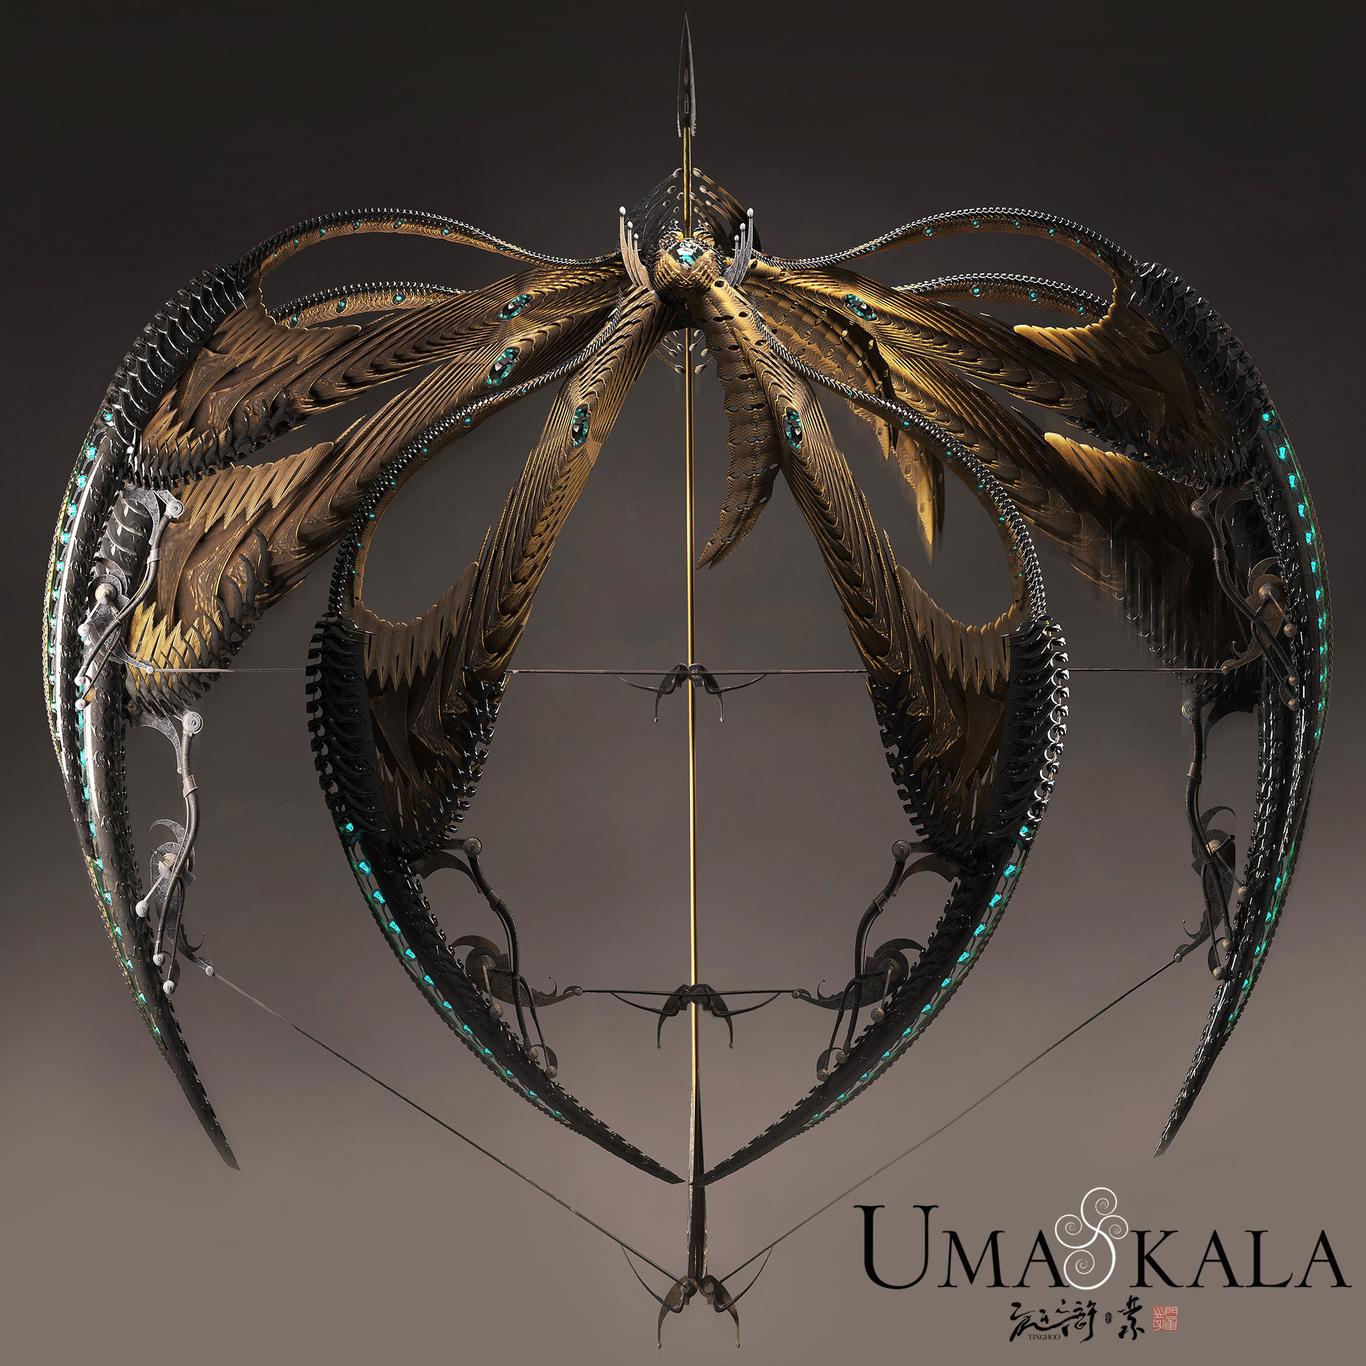 Armandosavoia umakala ranged and c 1 f3b4e01f u47v